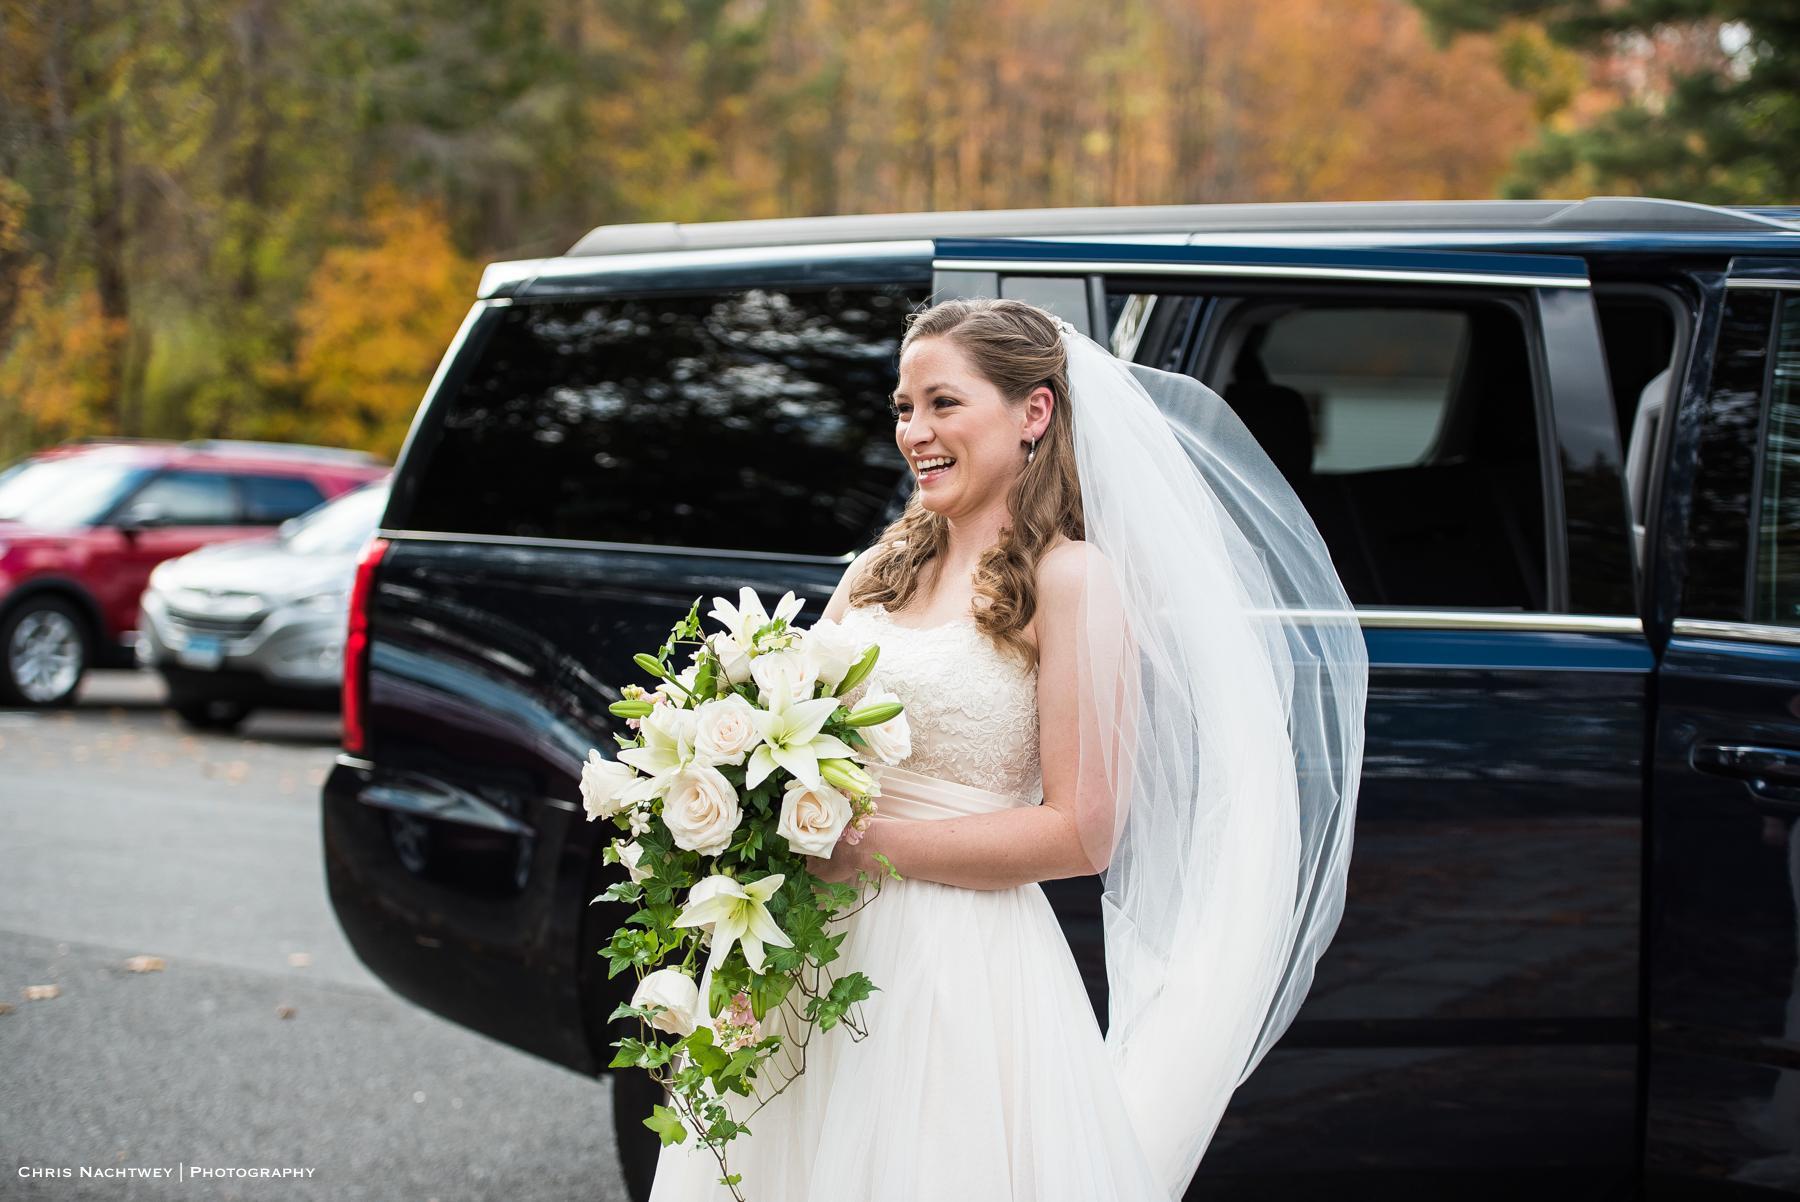 wedding-the-litchfield-inn-ct-photos-chris-nachtwey-photography-2018-16.jpg